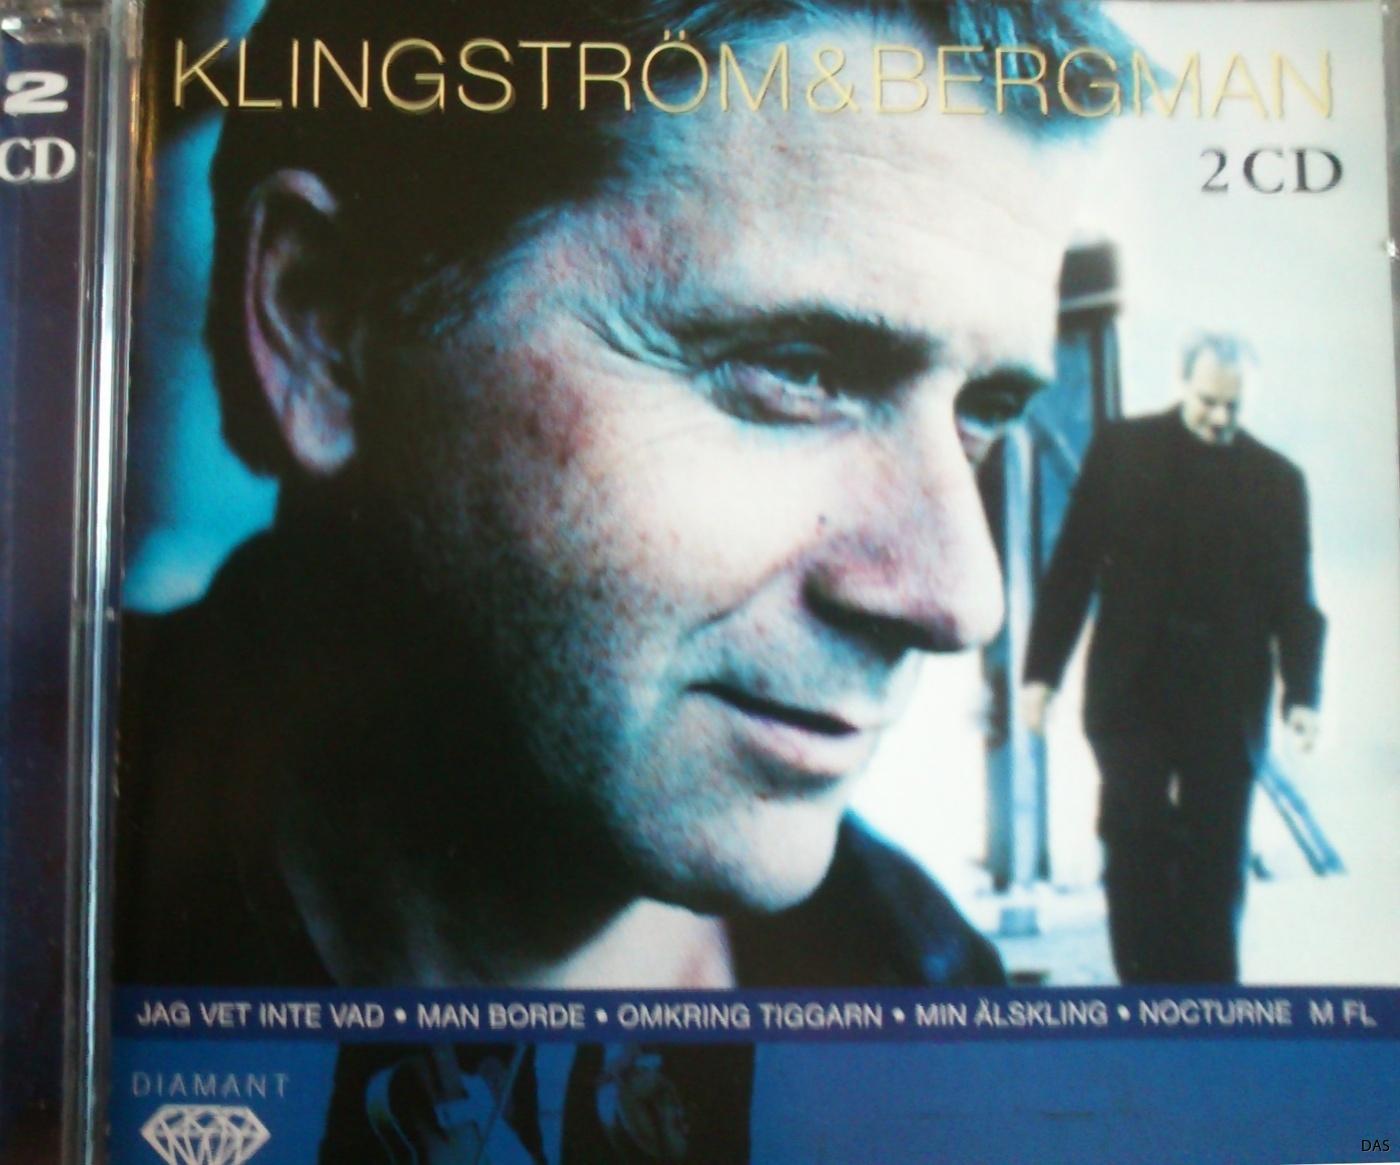 KlingströmBergman